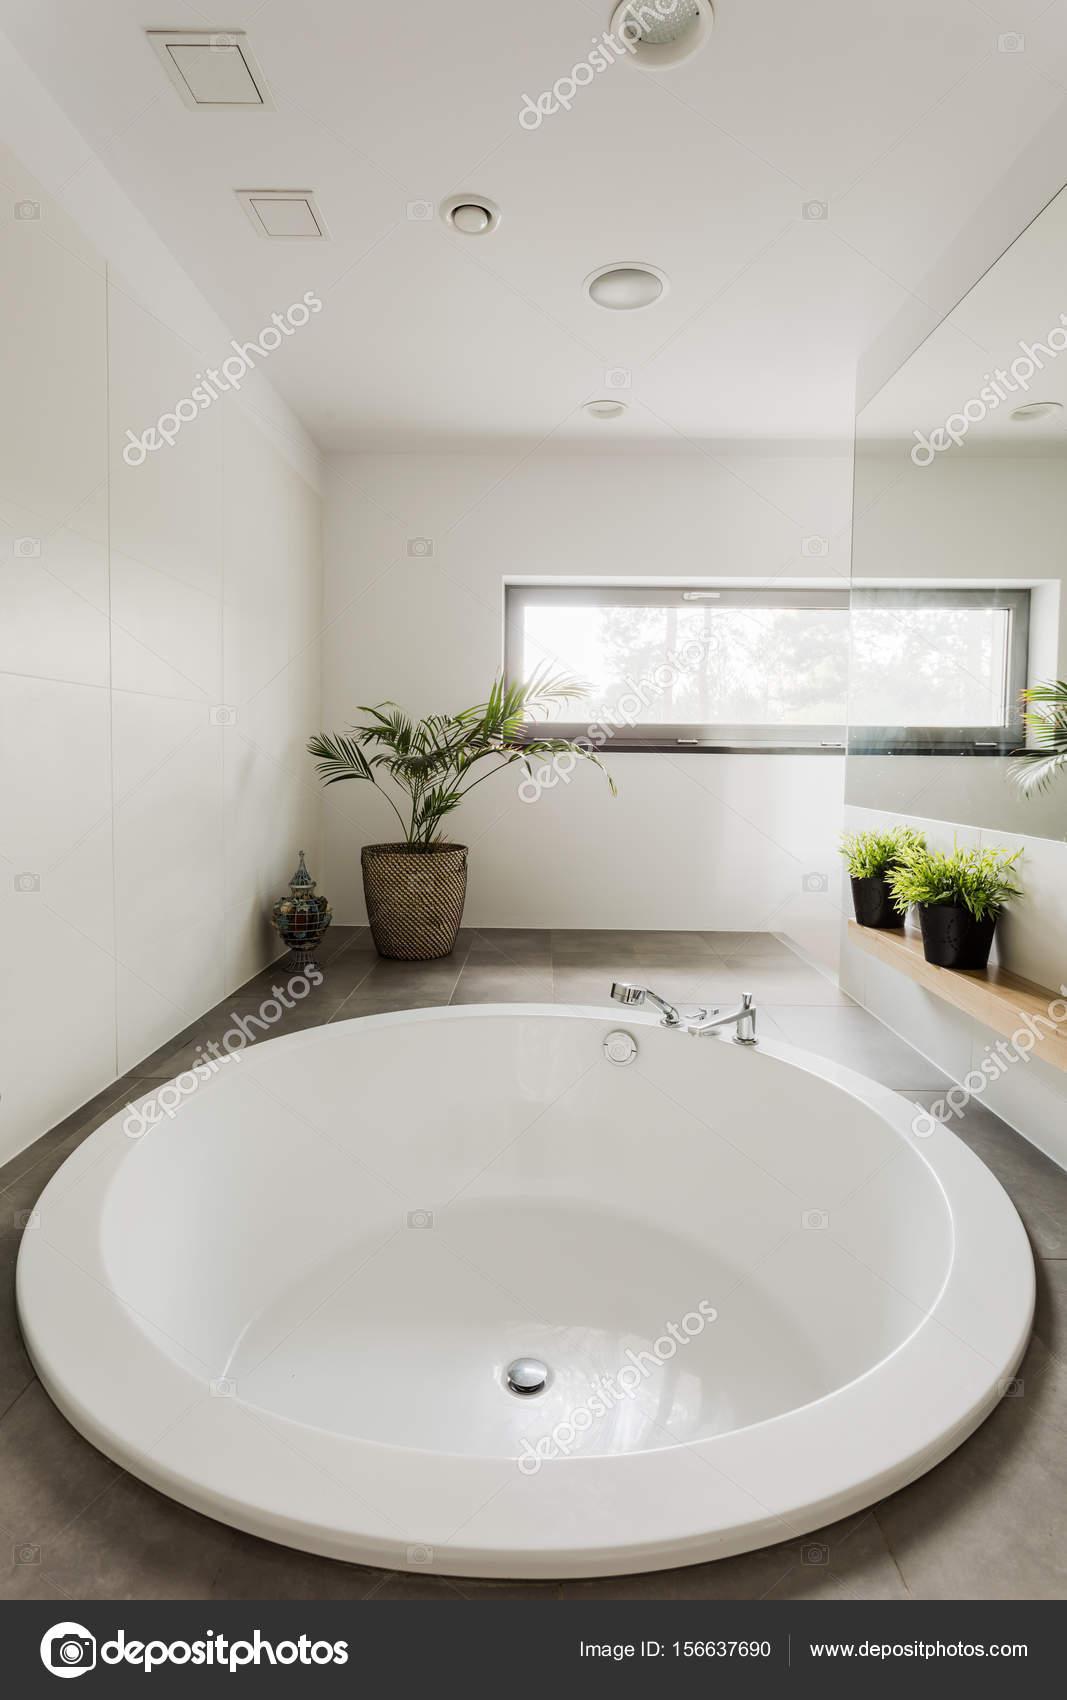 Salle De Bain King Size ~ salle de bains moderne avec baignoire ronde photographie